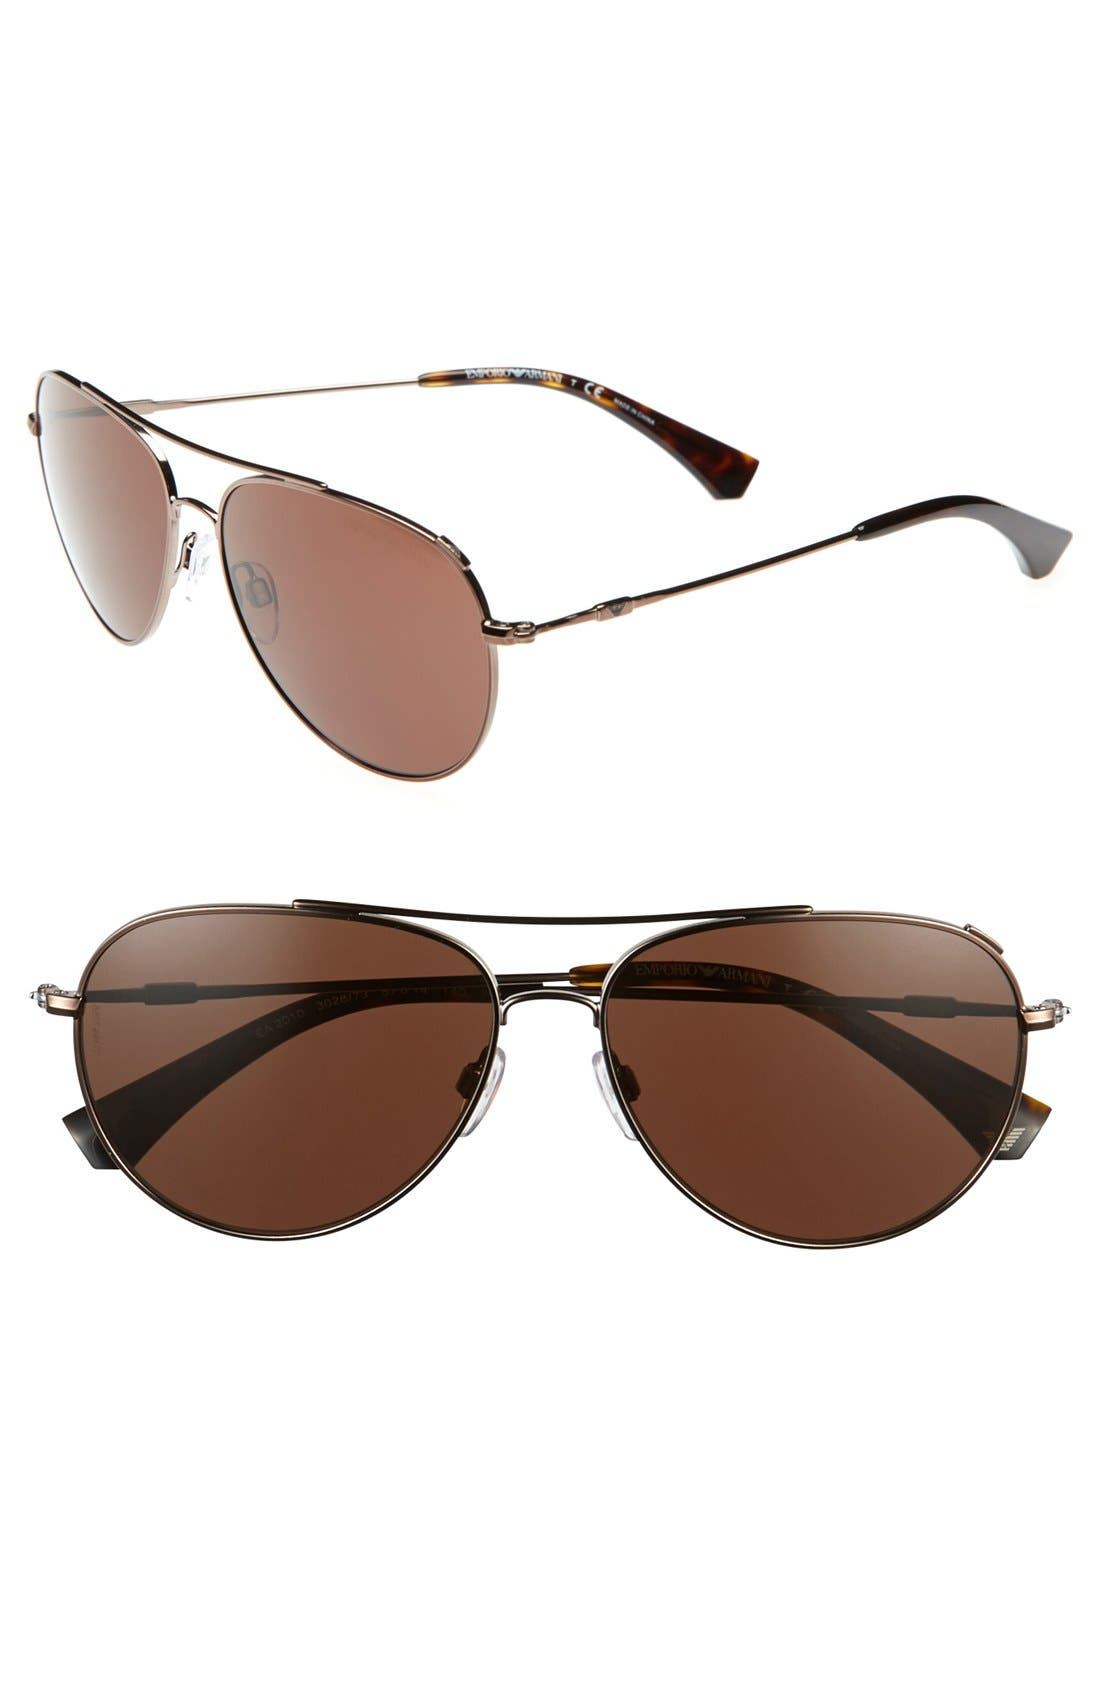 Main Image - Emporio Armani 57mm Aviator Sunglasses